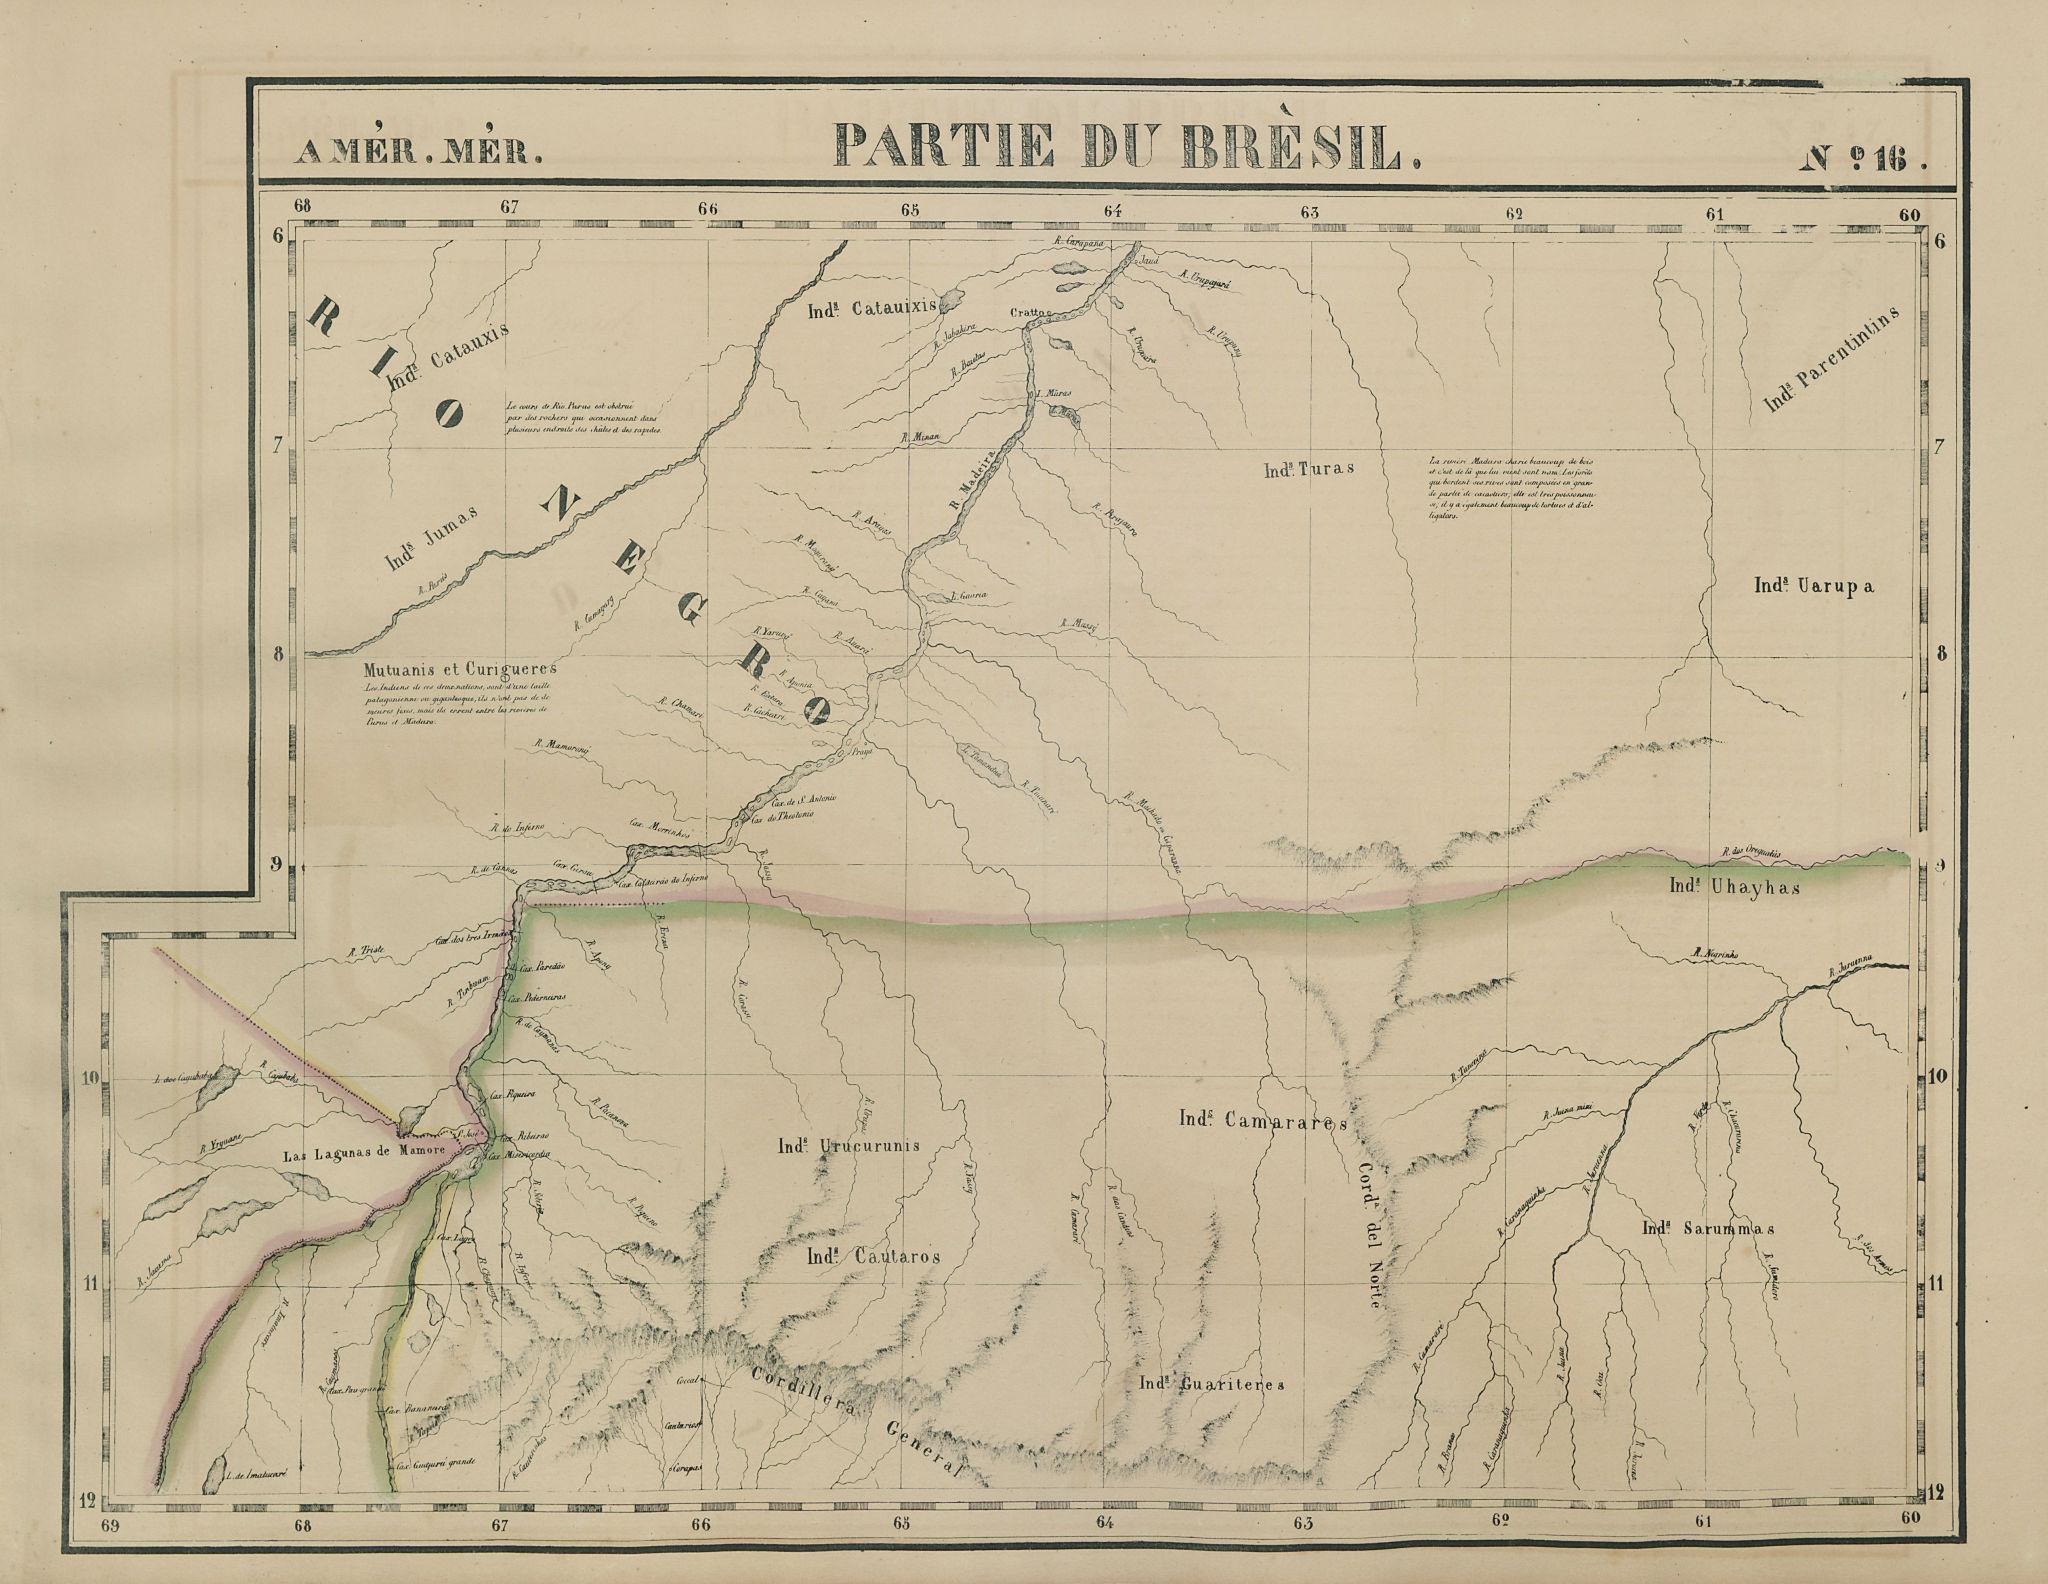 Amér Mér Brésil #16 North Bolivia. Western Brazil AM RO MT VANDERMAELEN 1827 map